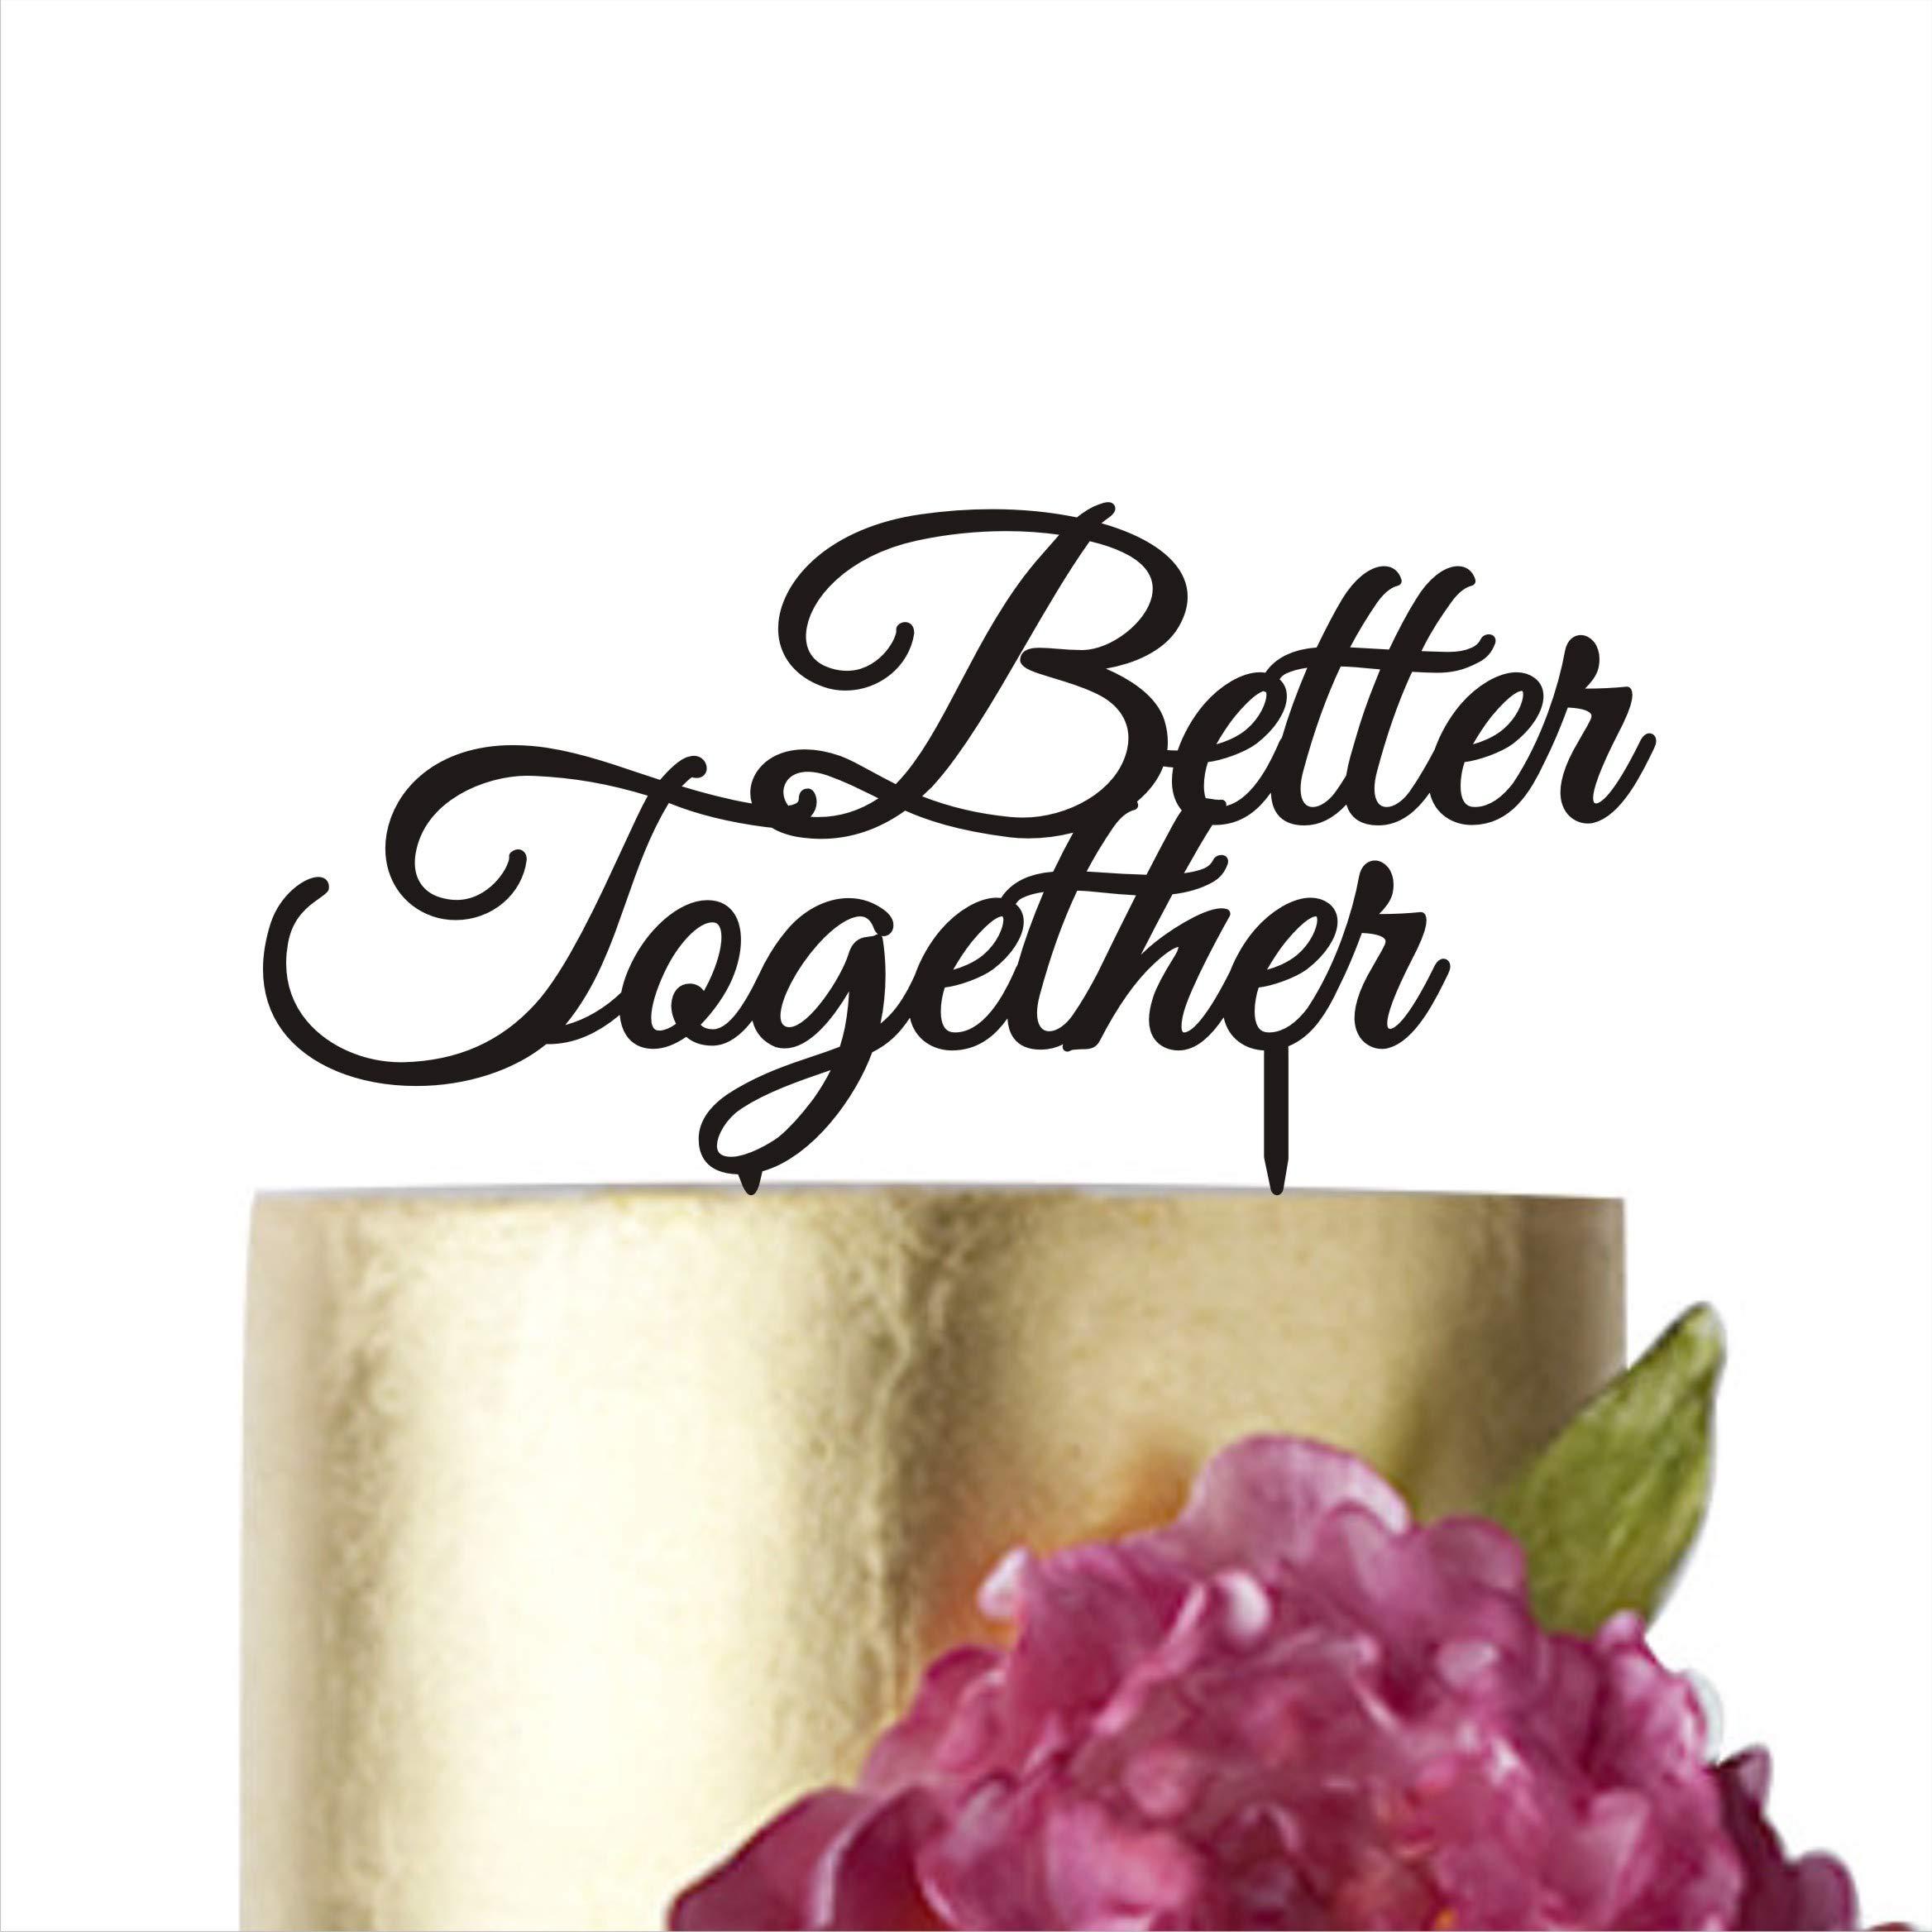 Better Together, Cake topper, Wedding Cake Toppers, Cake Topper Wedding, Cake toppers, Anniversary Cake Topper, Birthday Cake Topper (width 7'', gold)